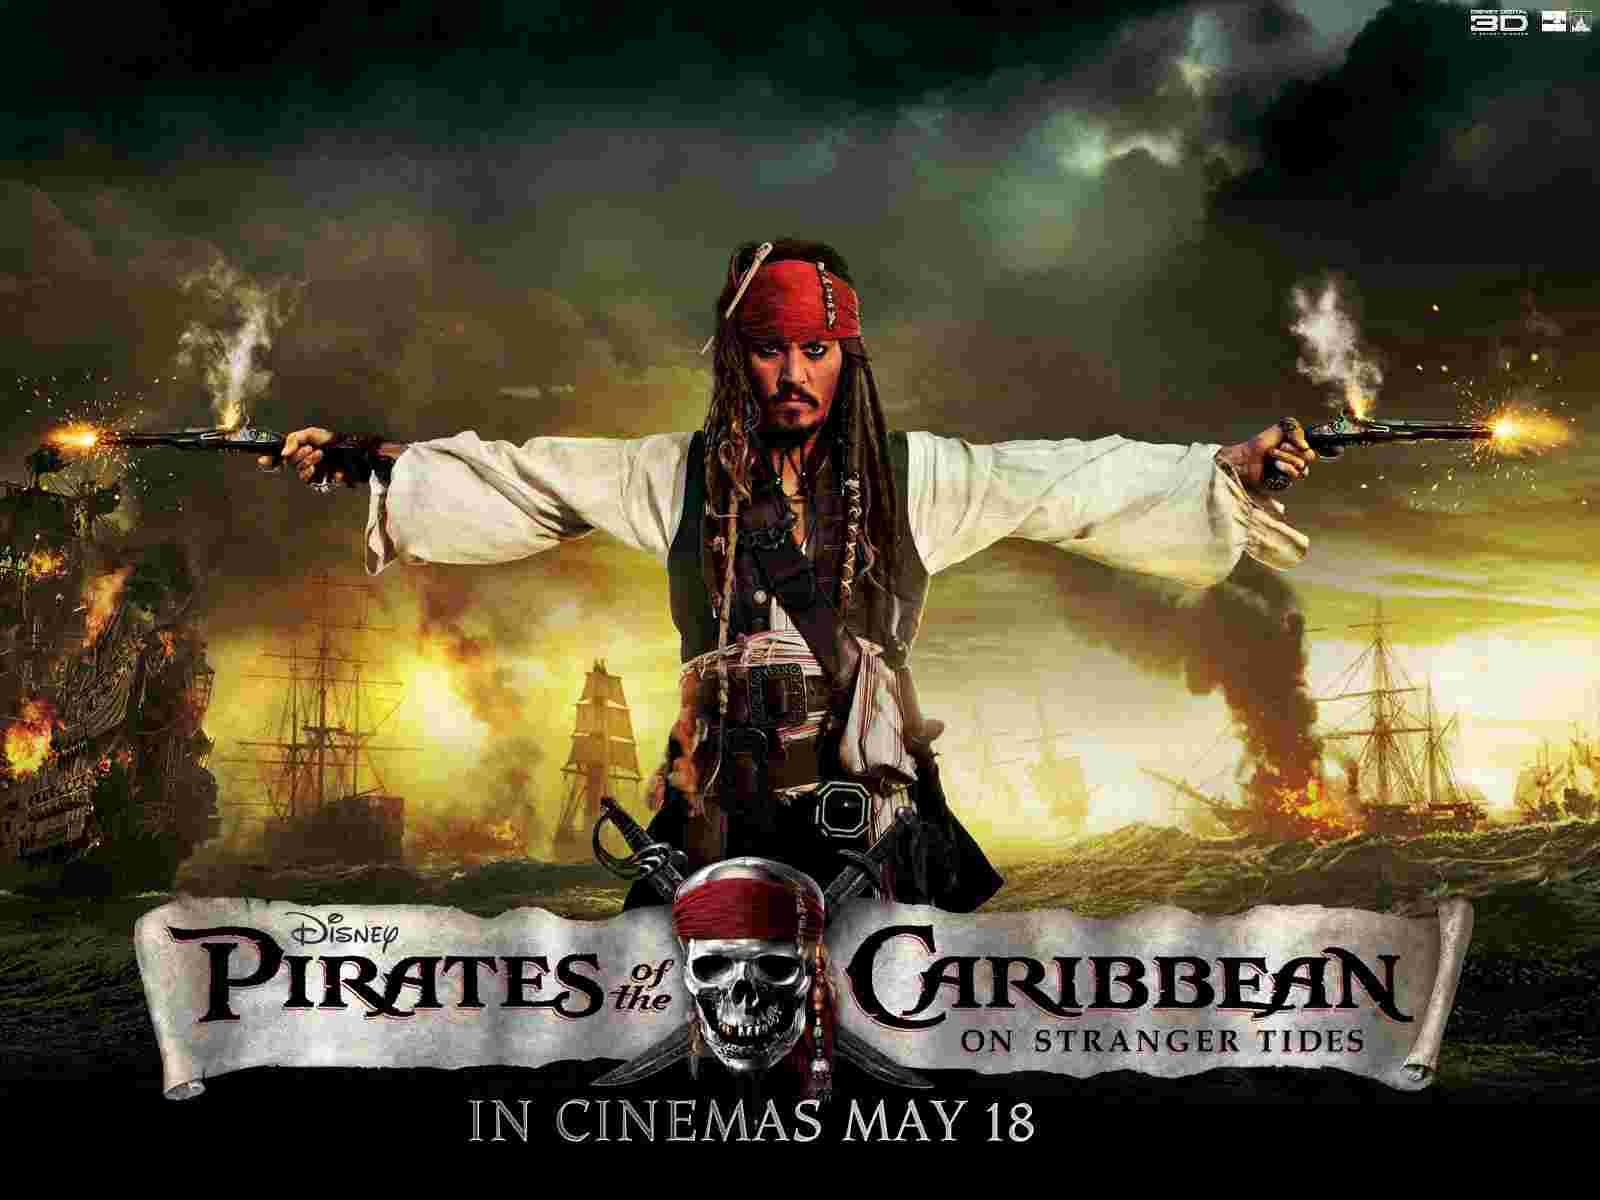 Barbossa From Pirates Of The Caribbean Desktop Wallpaper 1600x1200